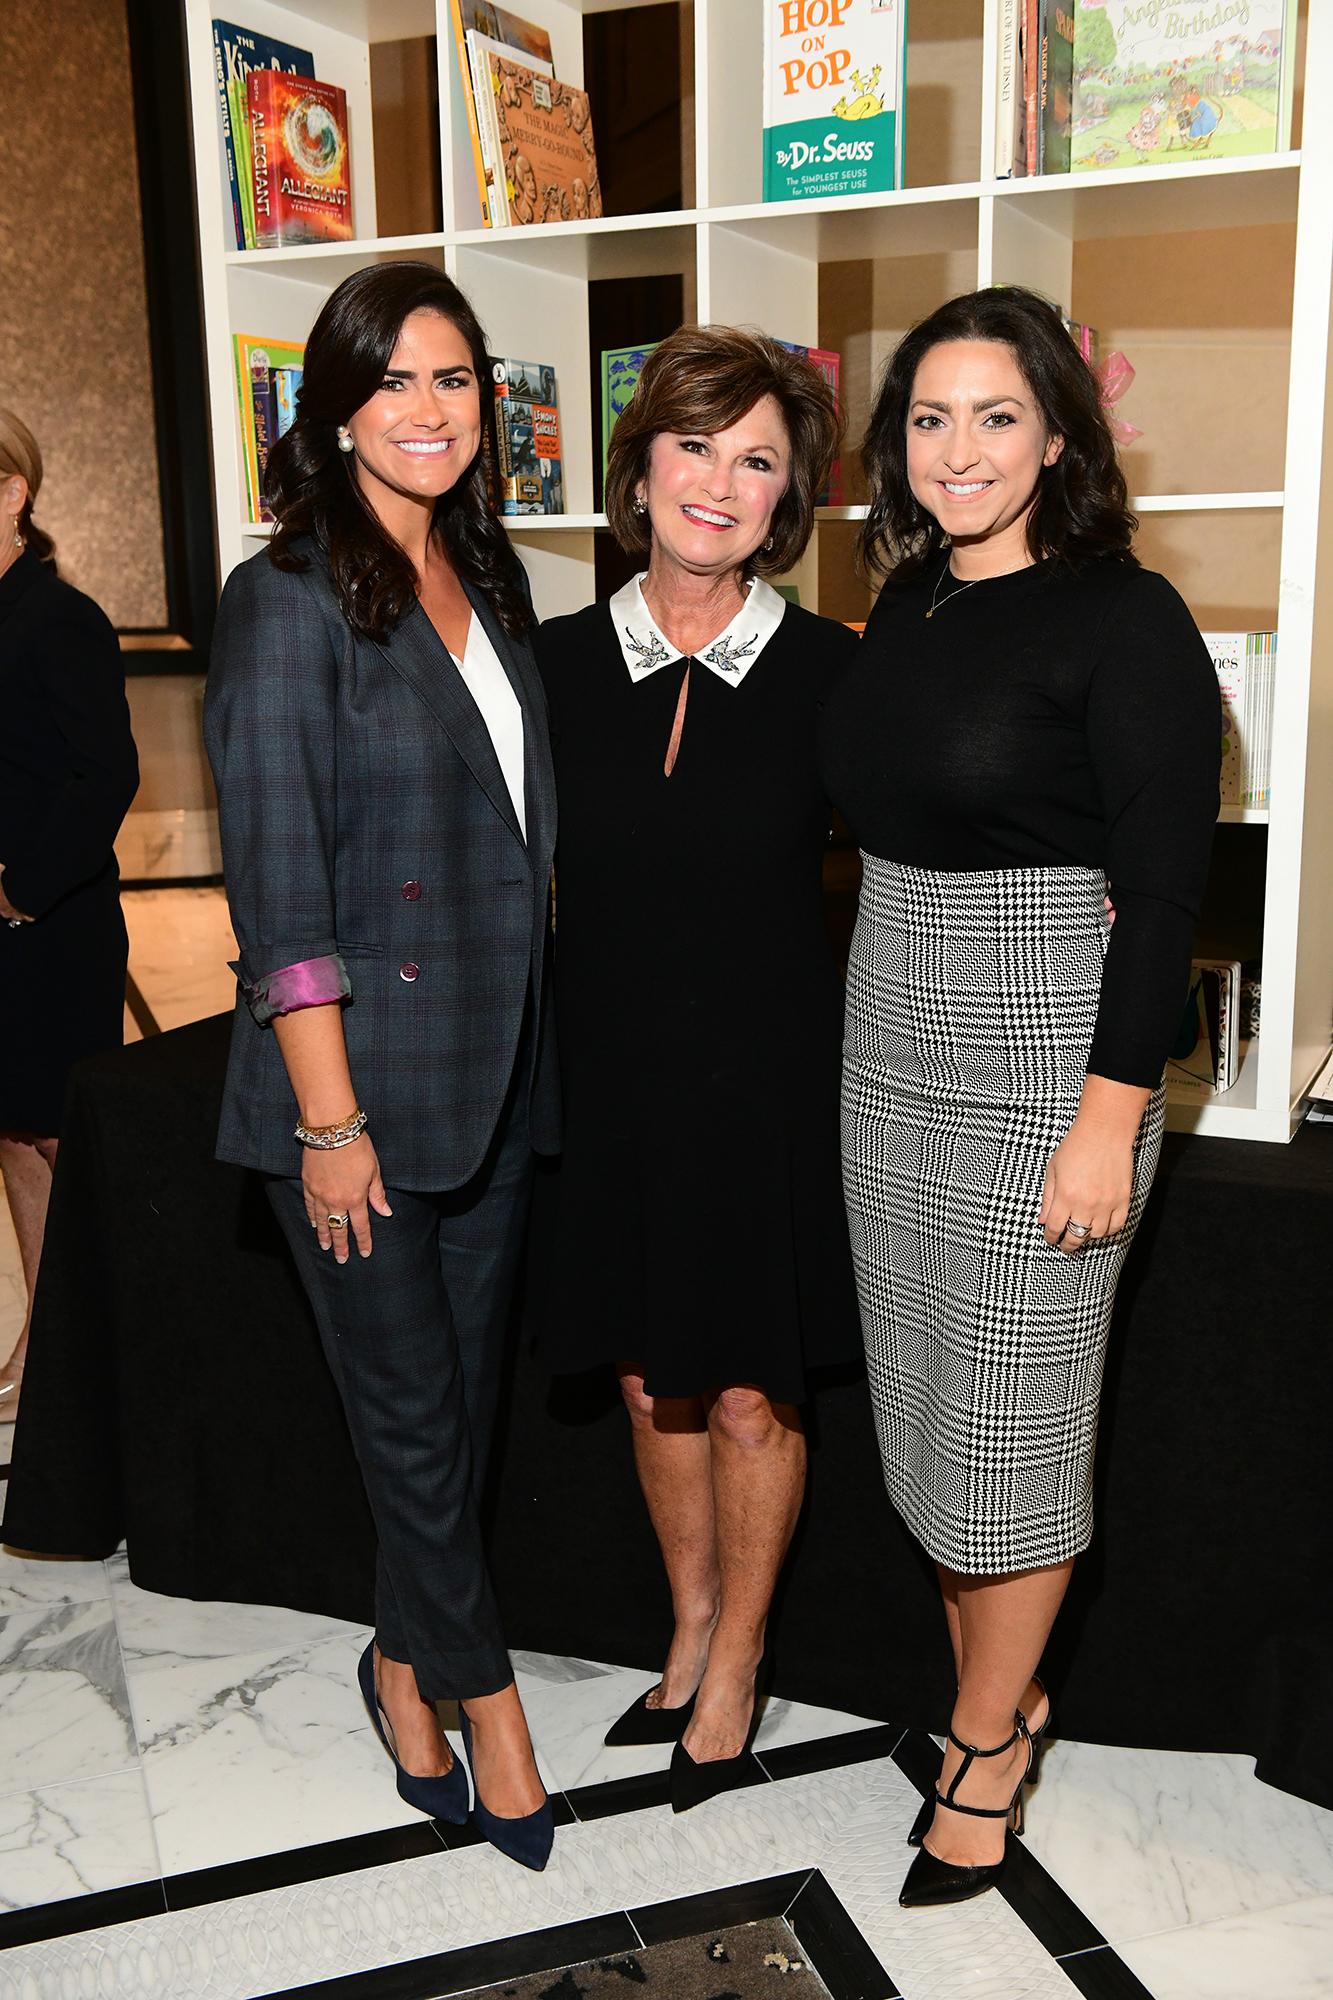 Allison Schulze, Lisa Jakel, Emily George; Photo by Daniel Ortiz.jpg